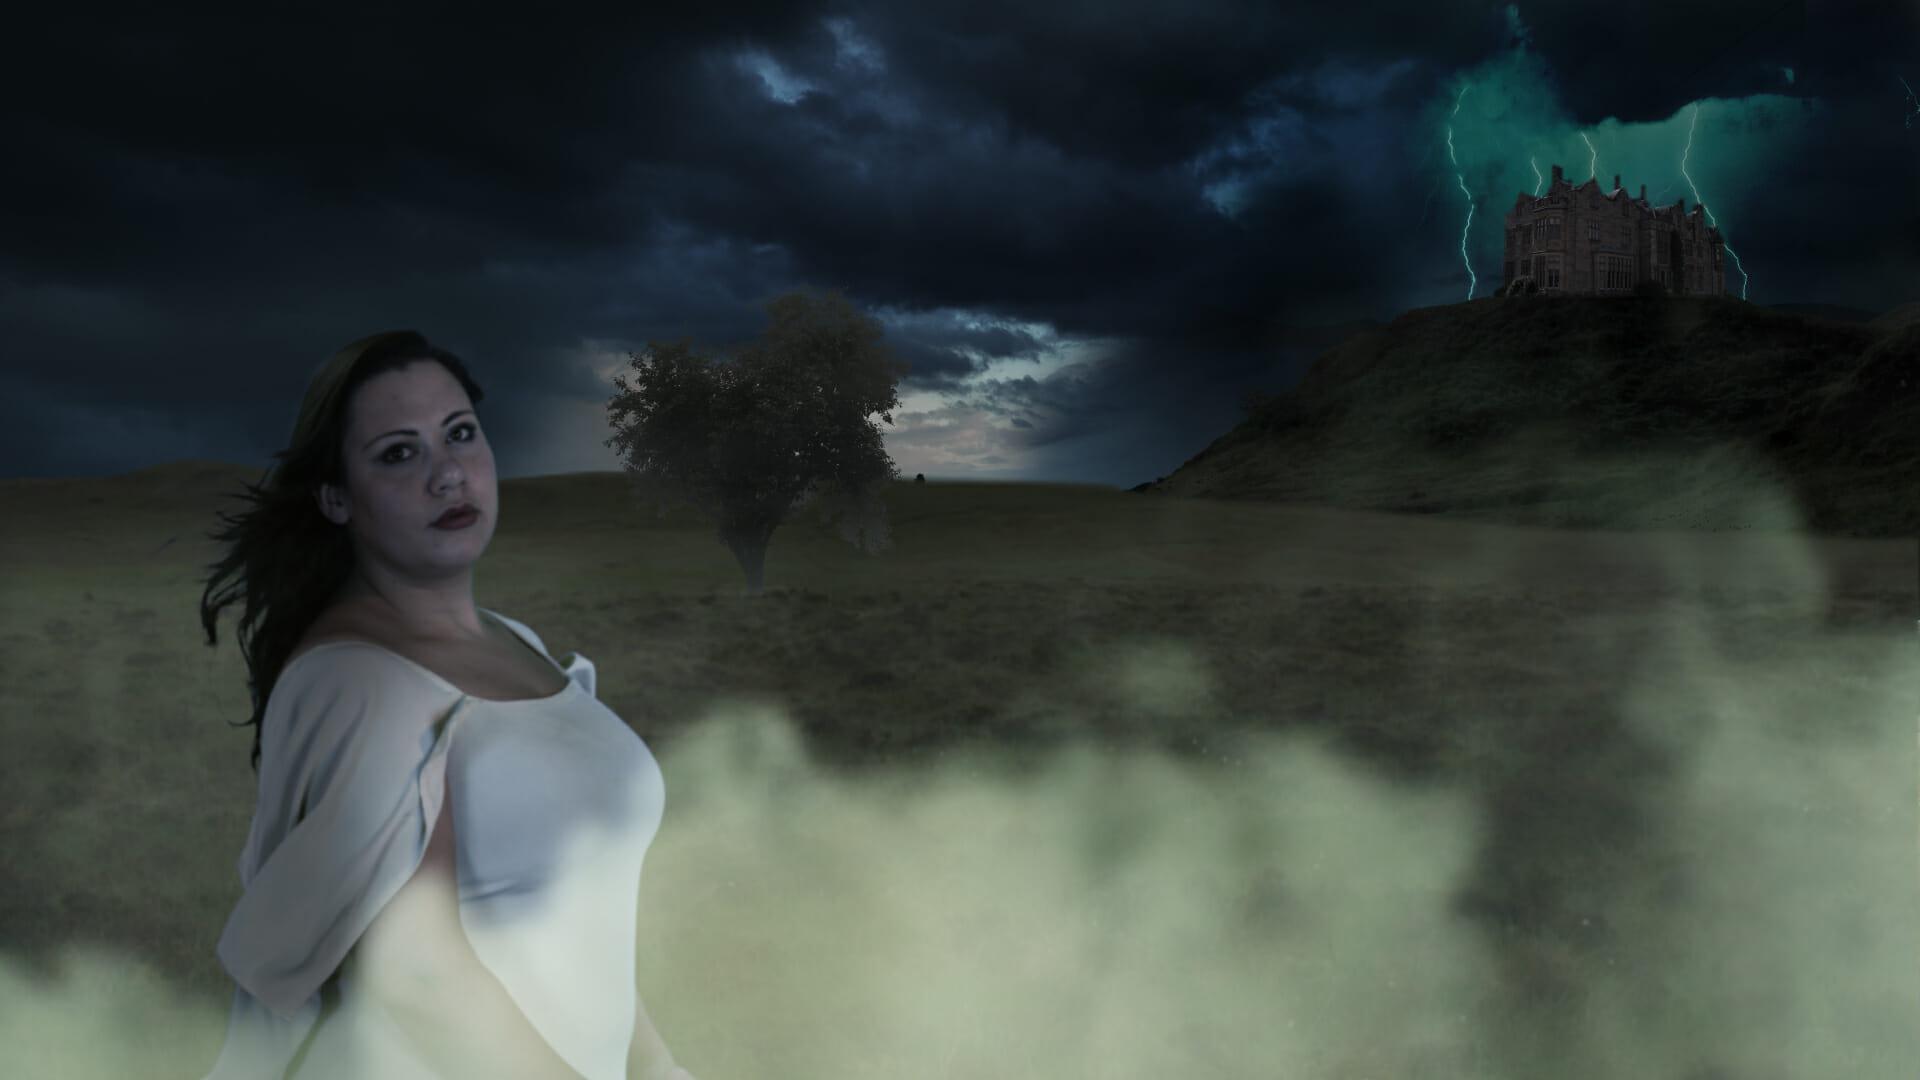 Final promotional image